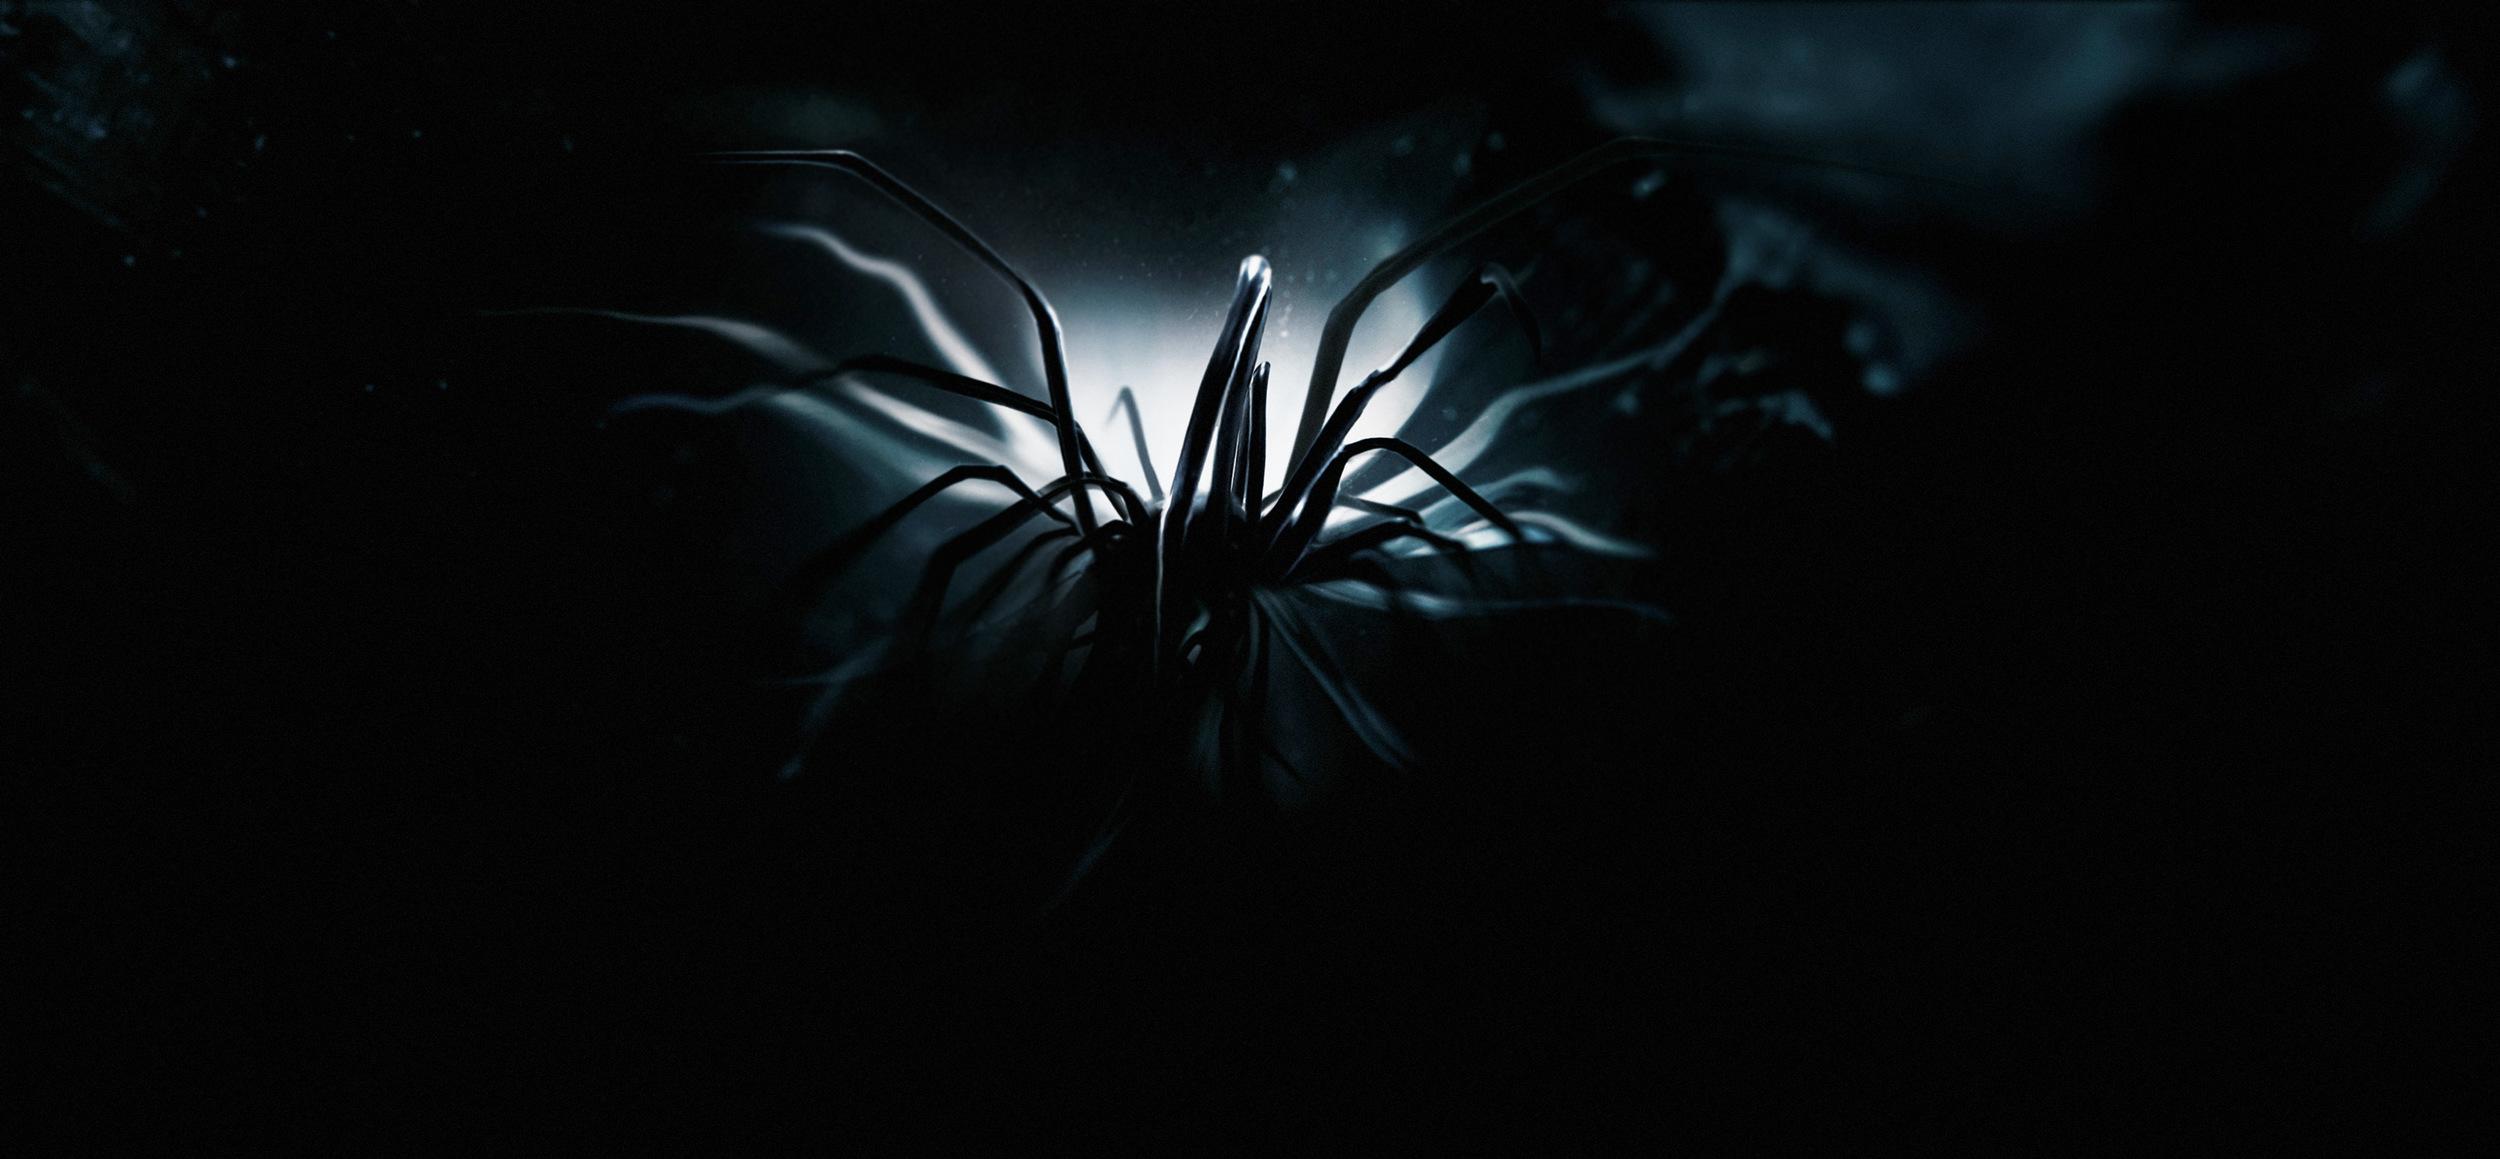 Lauren-Indovina-Penny-Dreadful-Titles-PSYOP-Concept-Art-SpiderFlower-1.jpg